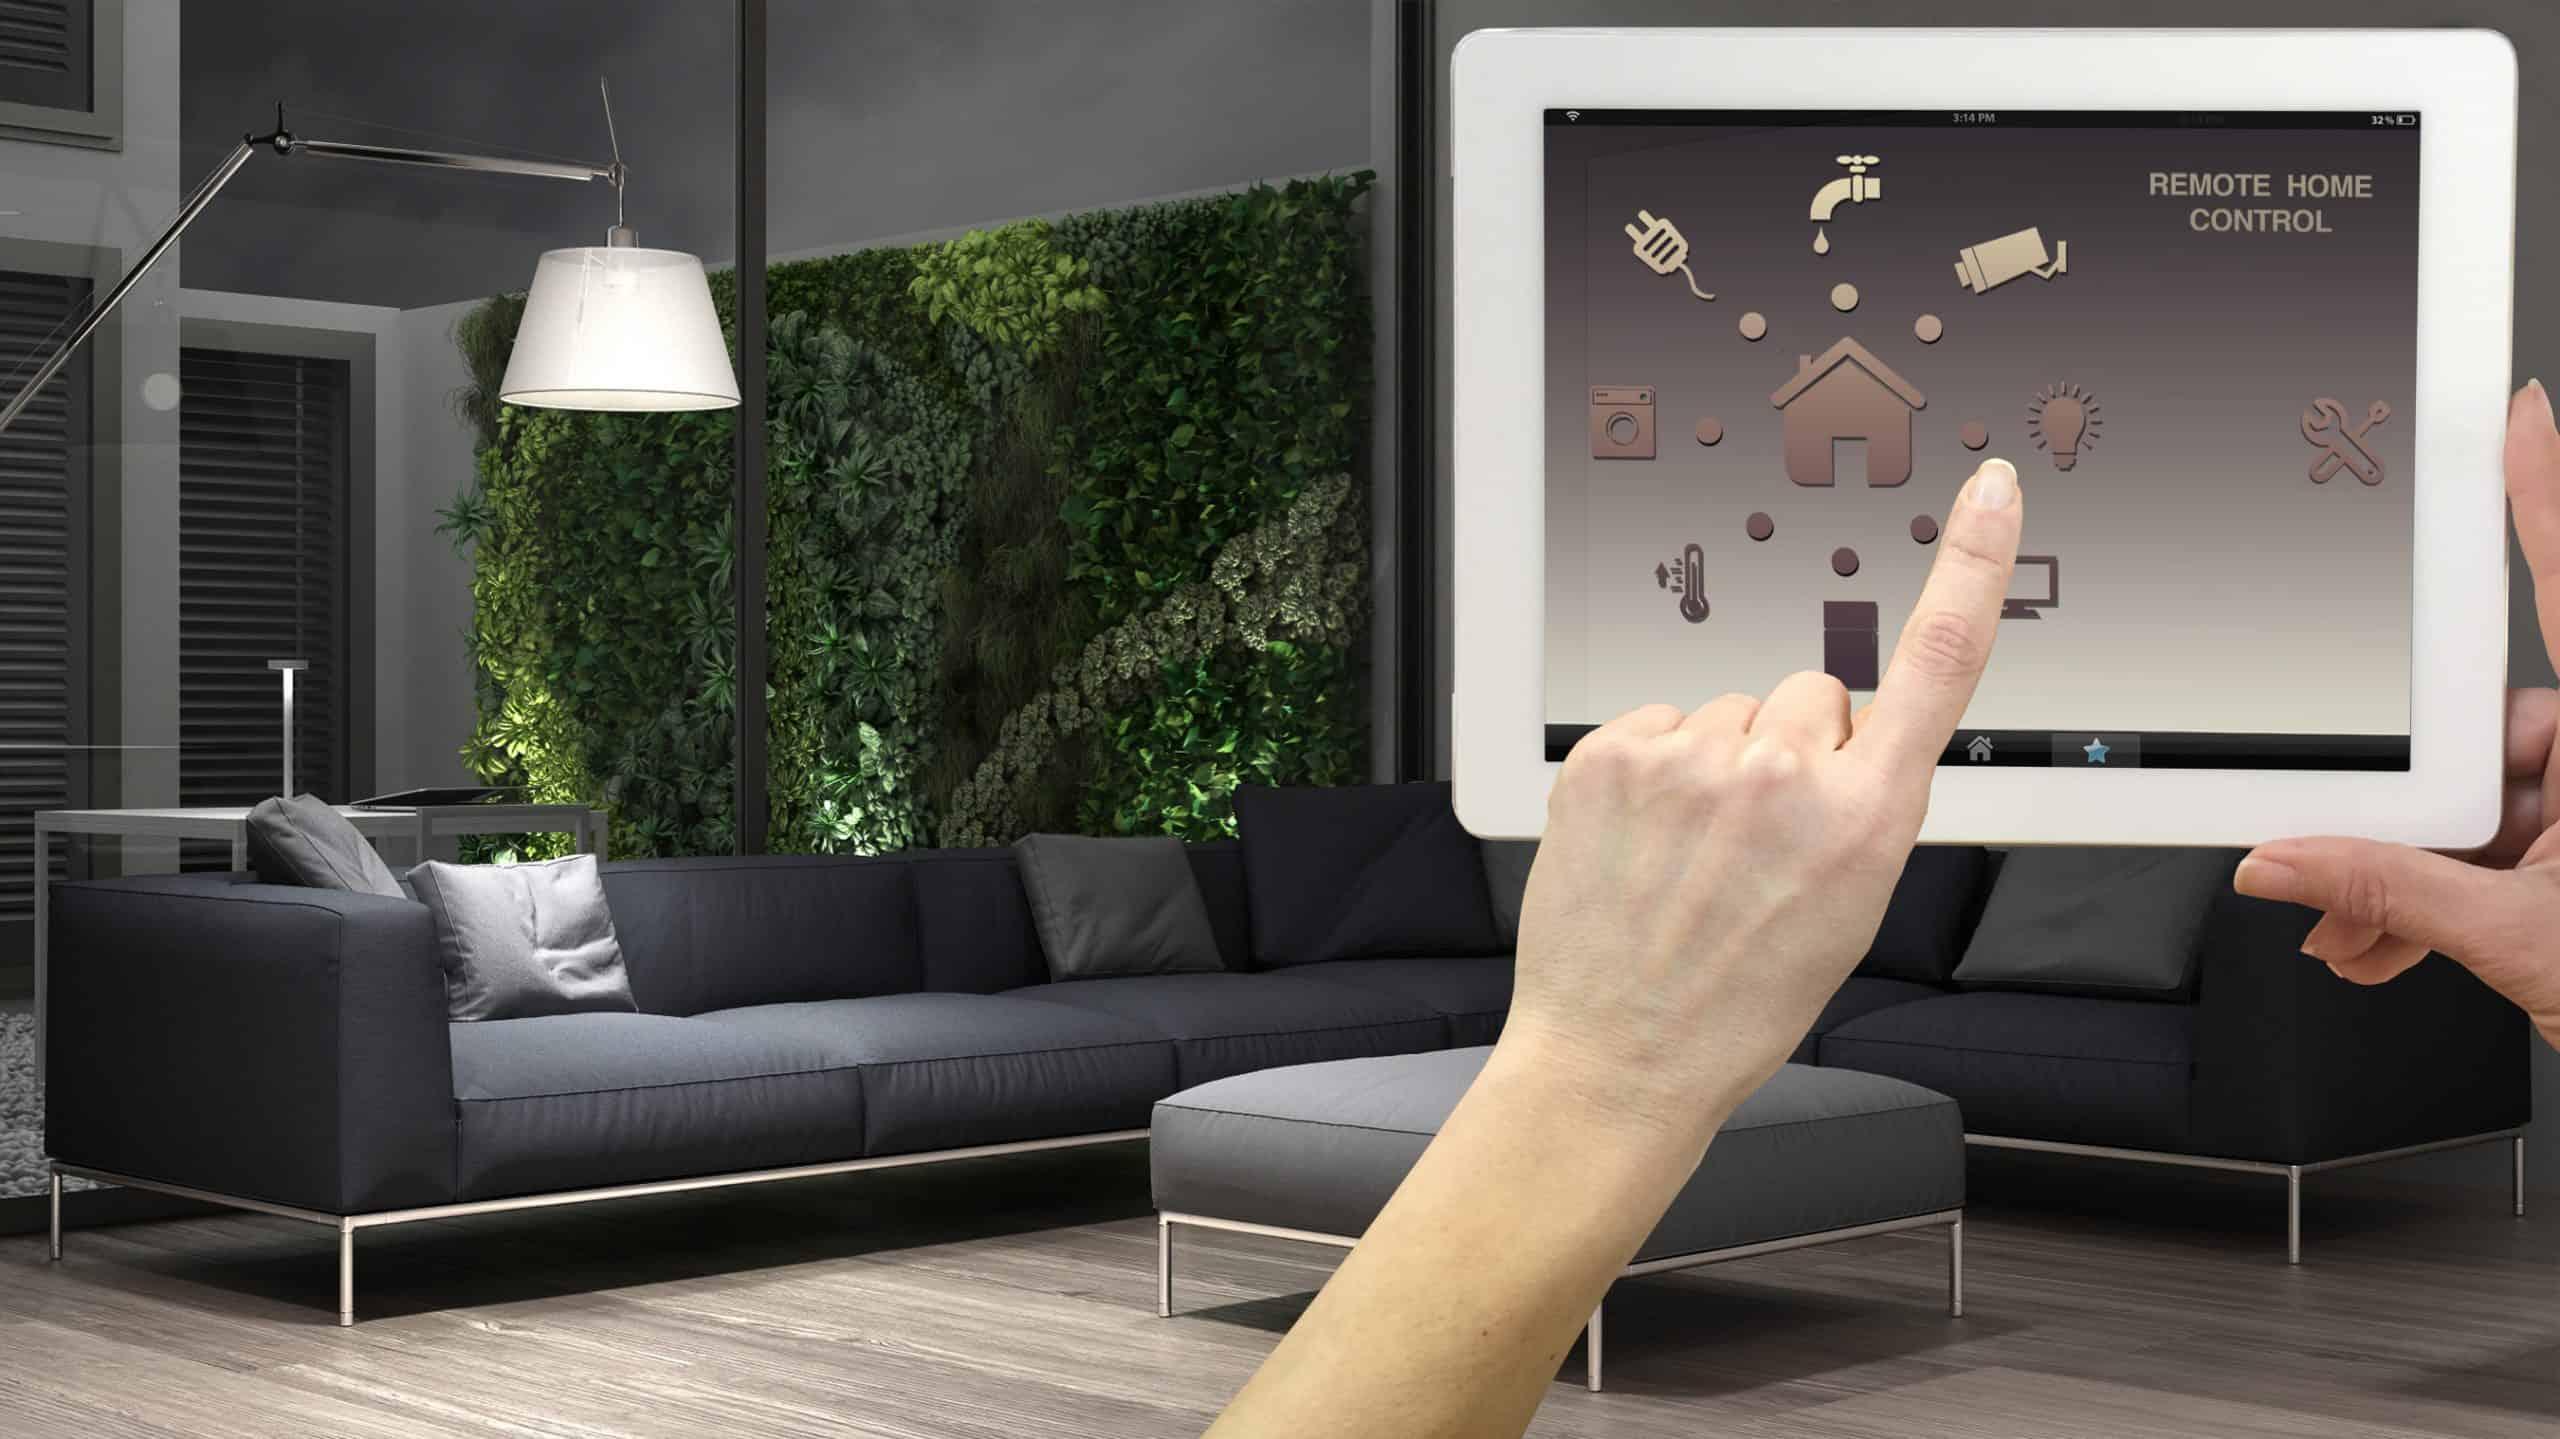 Smart remote home control display